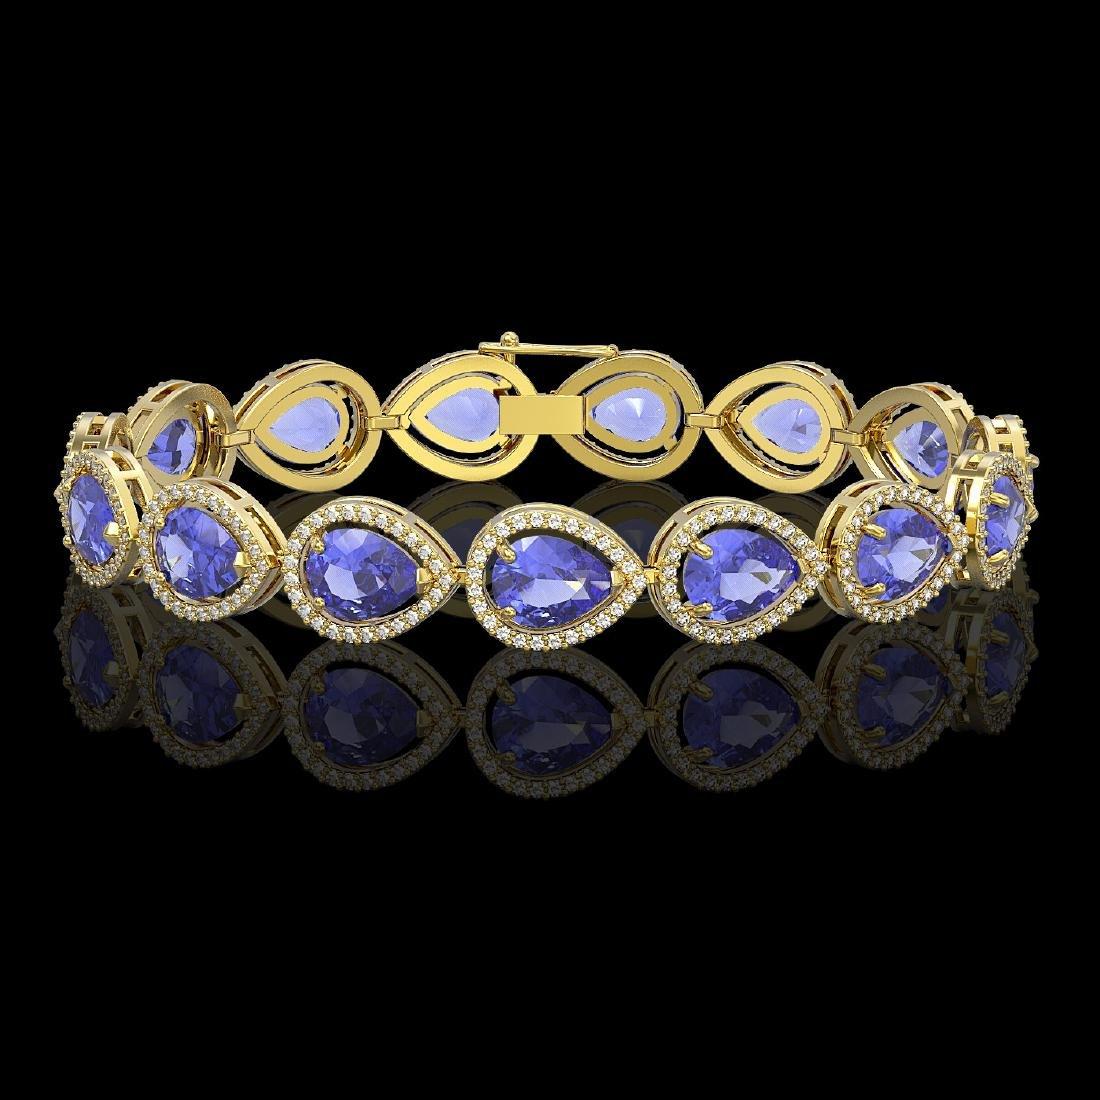 21.06 CTW Tanzanite & Diamond Halo Bracelet 10K Yellow